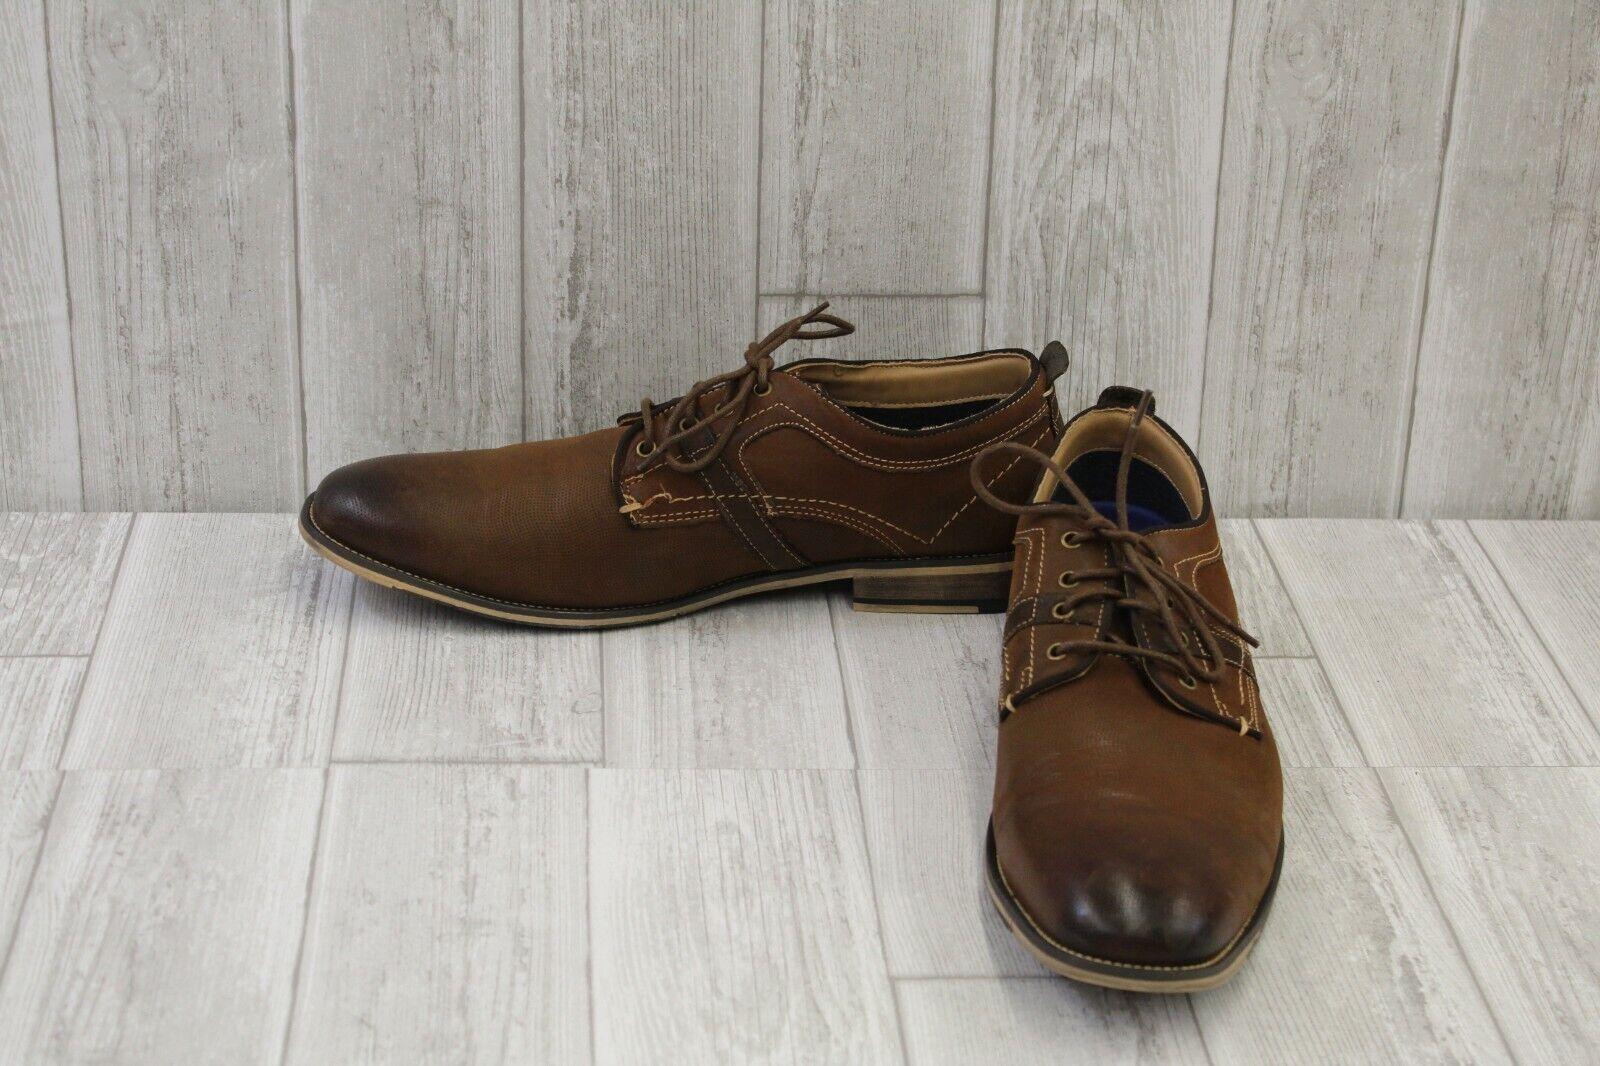 Steve Madden Jasco Oxford - Men's Size 13, Brown